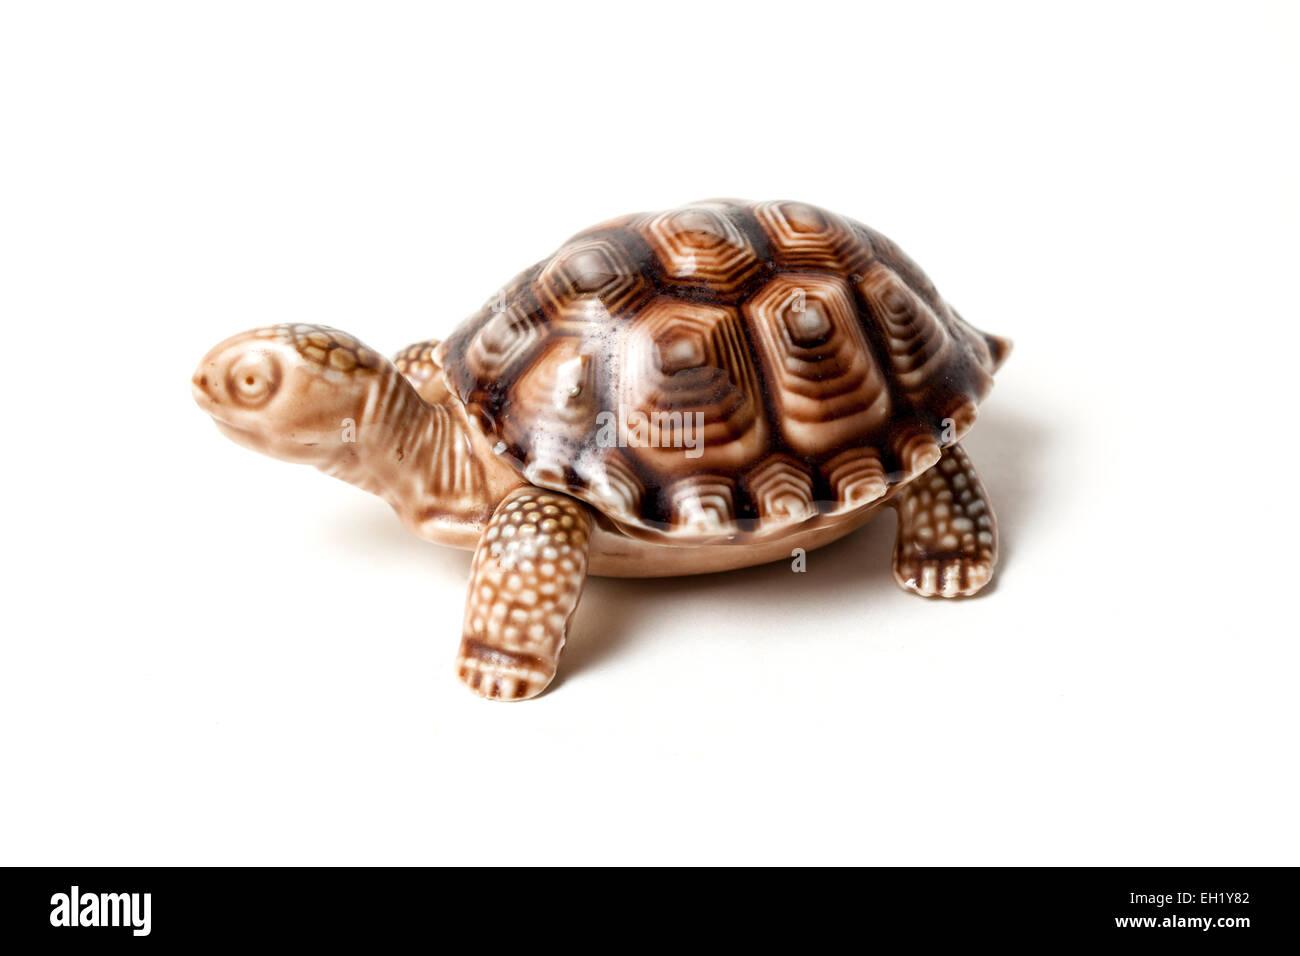 Wade pottery tortoise trinket holder. - Stock Image